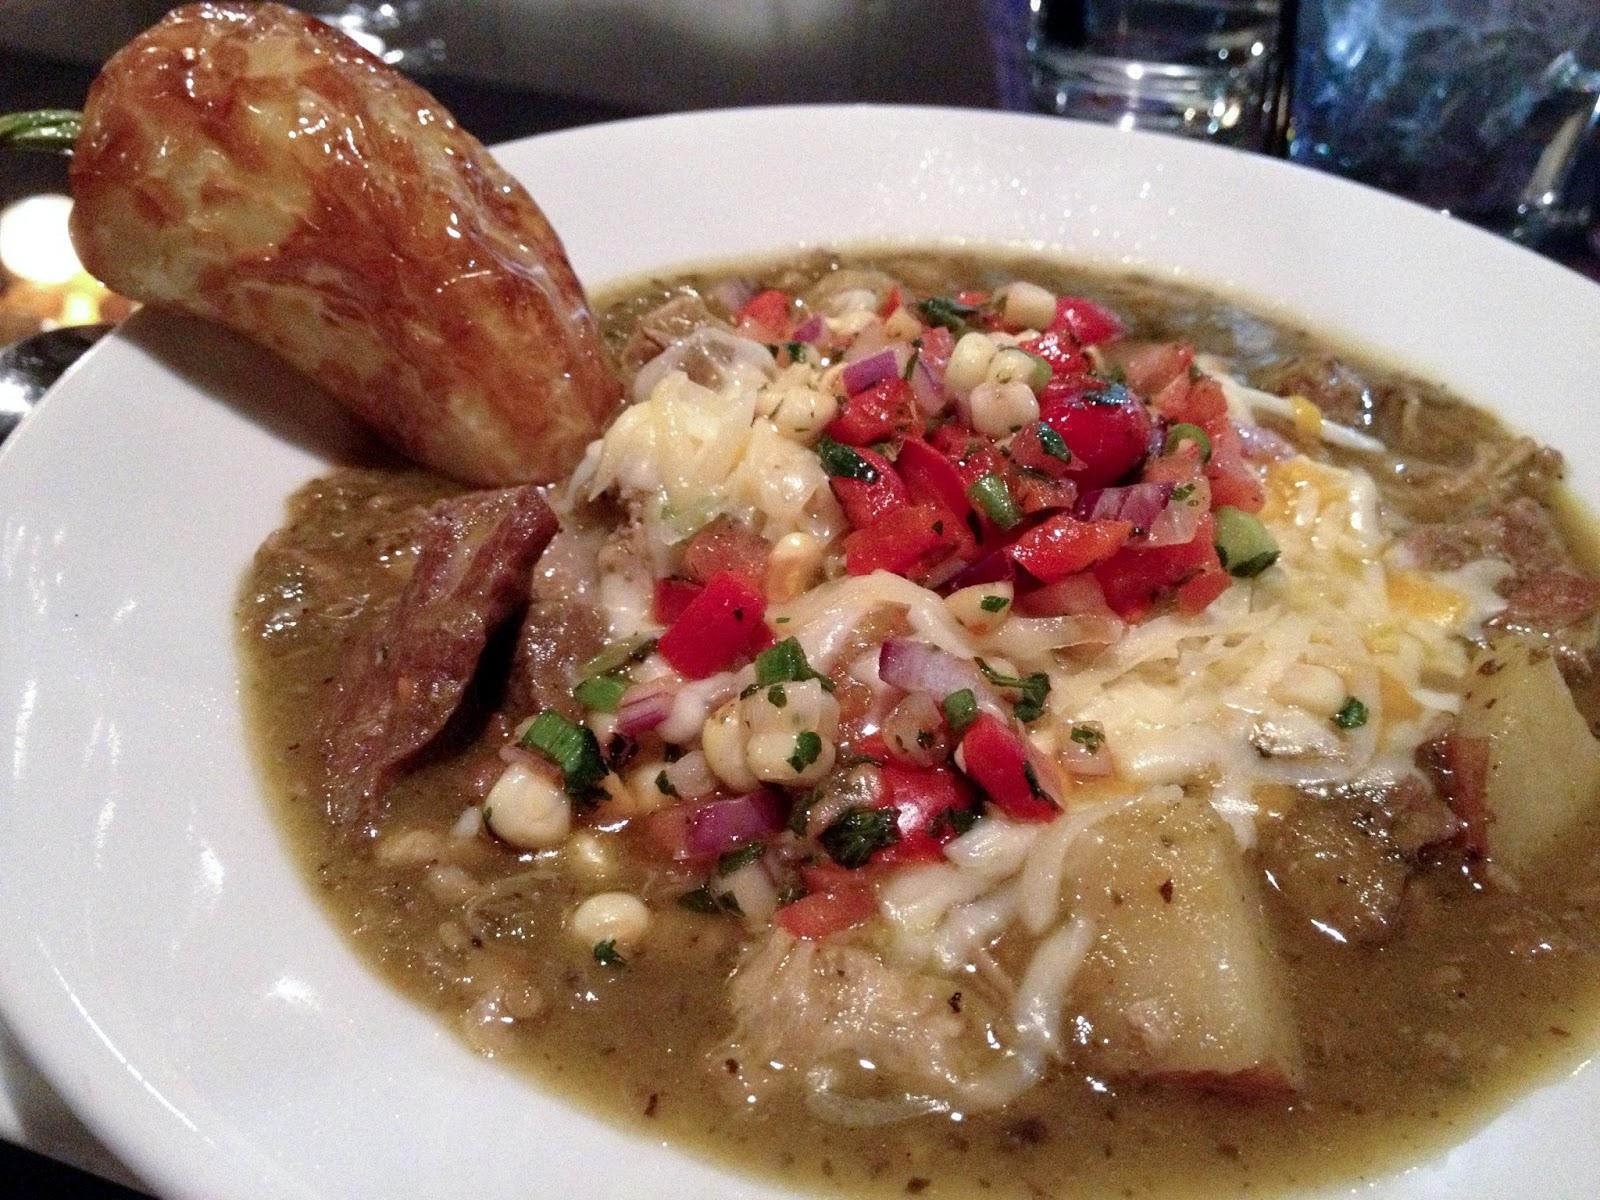 food blog, food blogger, pork, soup, chili, potato, corn, salsa, fry bread, black sheep cafe, green chili pork soup, soup, places to eat in provo, provo restaurants,